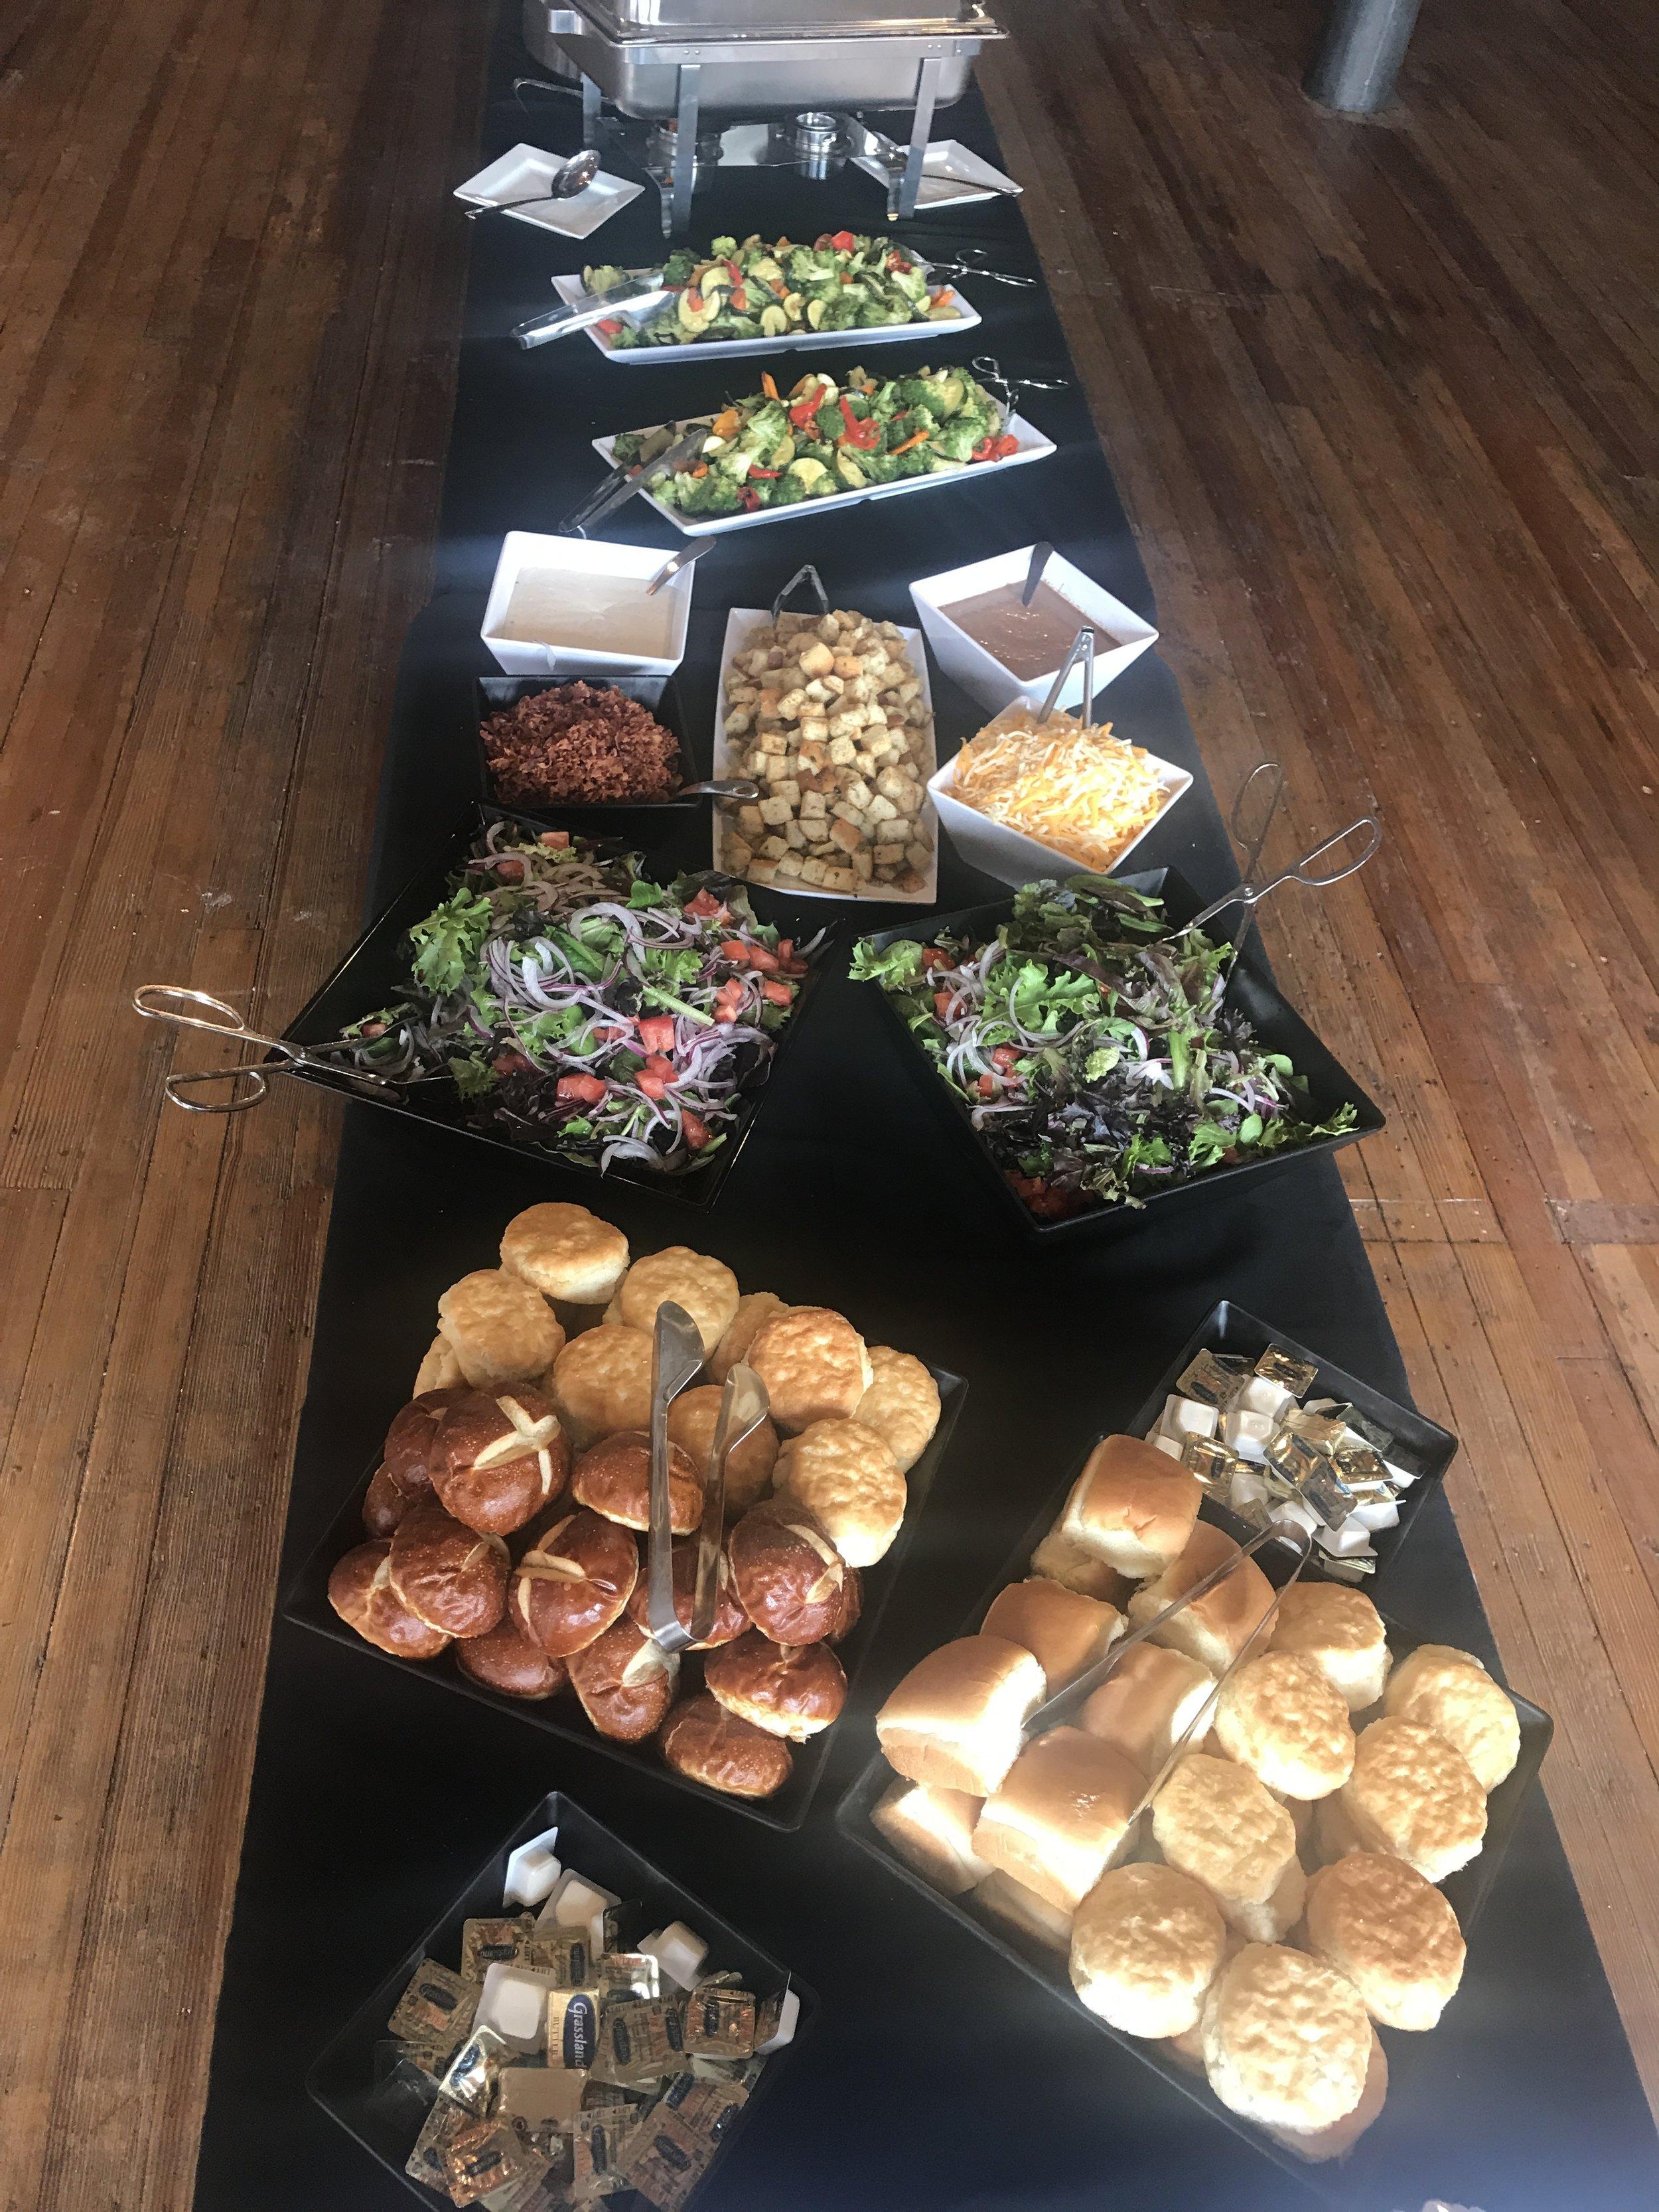 box-lunches-breakfast-buffett-appetizers-full-buffett-office-catering-lenexa-mission-hills-plaza-kcmo-organic8.jpg